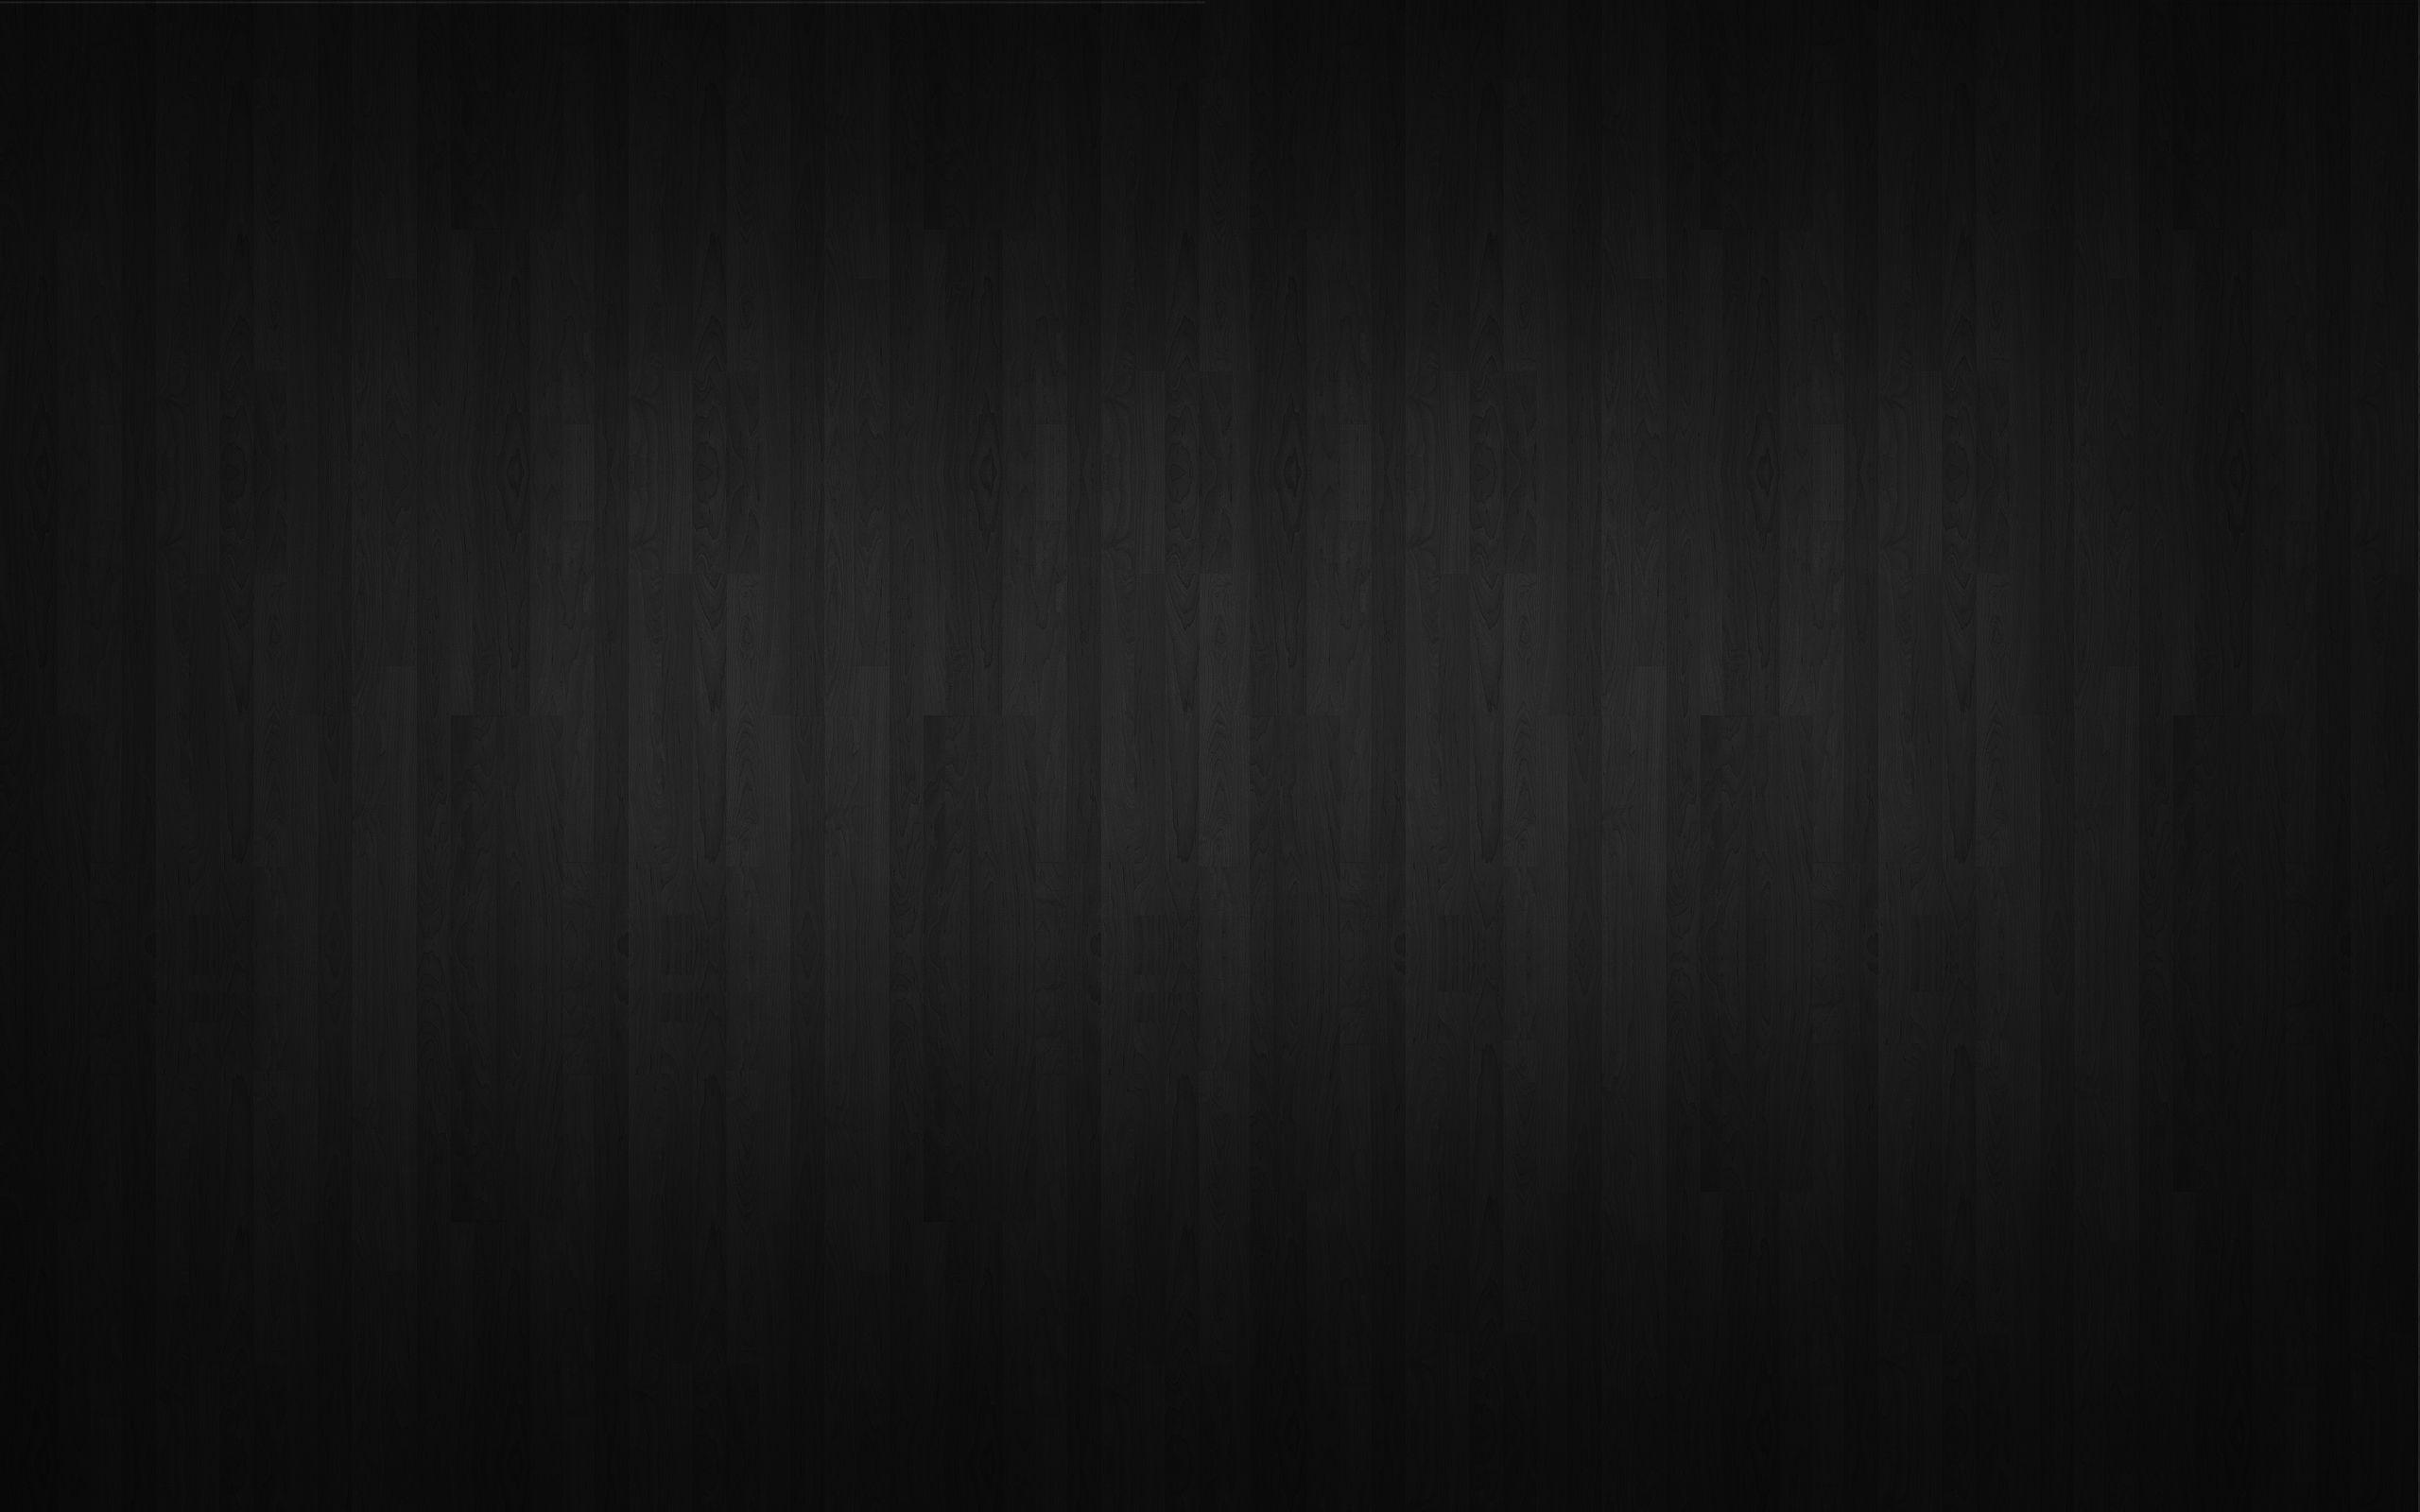 Hufflepuff Wallpaper Iphone Black Wood Wallpapers Wallpaper Cave